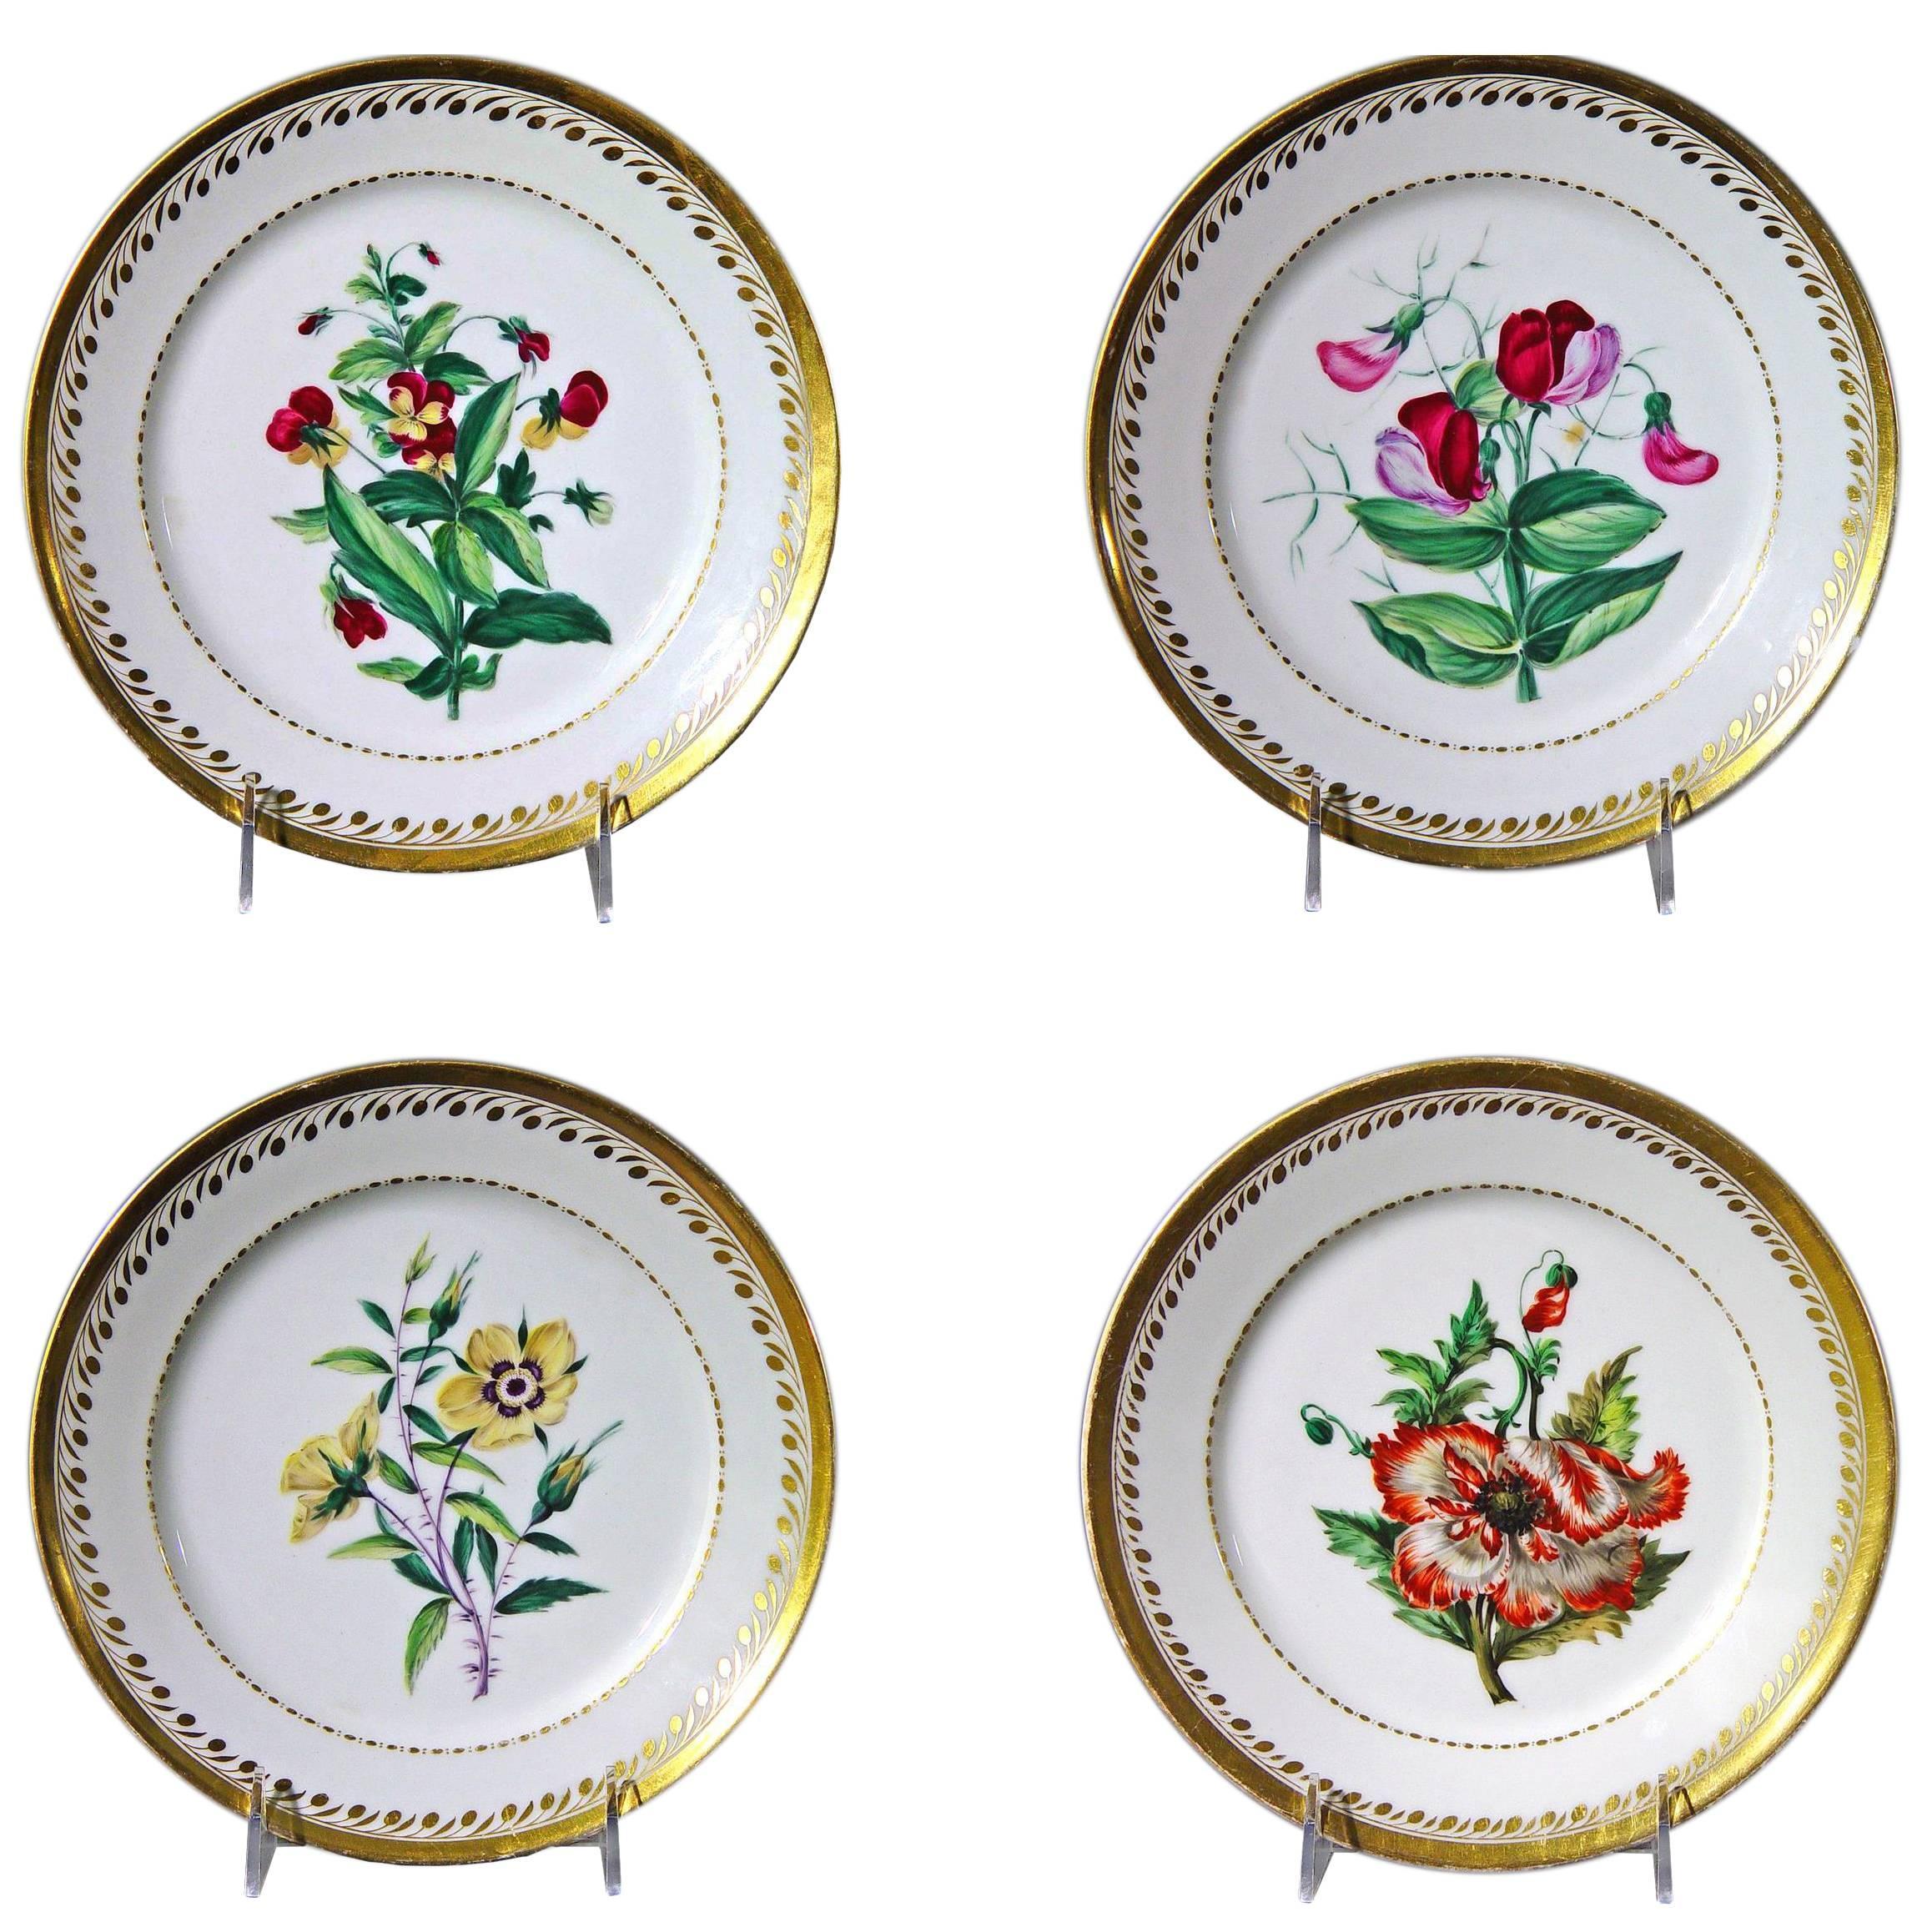 Set of 12 English Porcelain Botanical Plates Minton circa 1860 For Sale at 1stdibs  sc 1 st  1stDibs & Set of 12 English Porcelain Botanical Plates Minton circa 1860 For ...